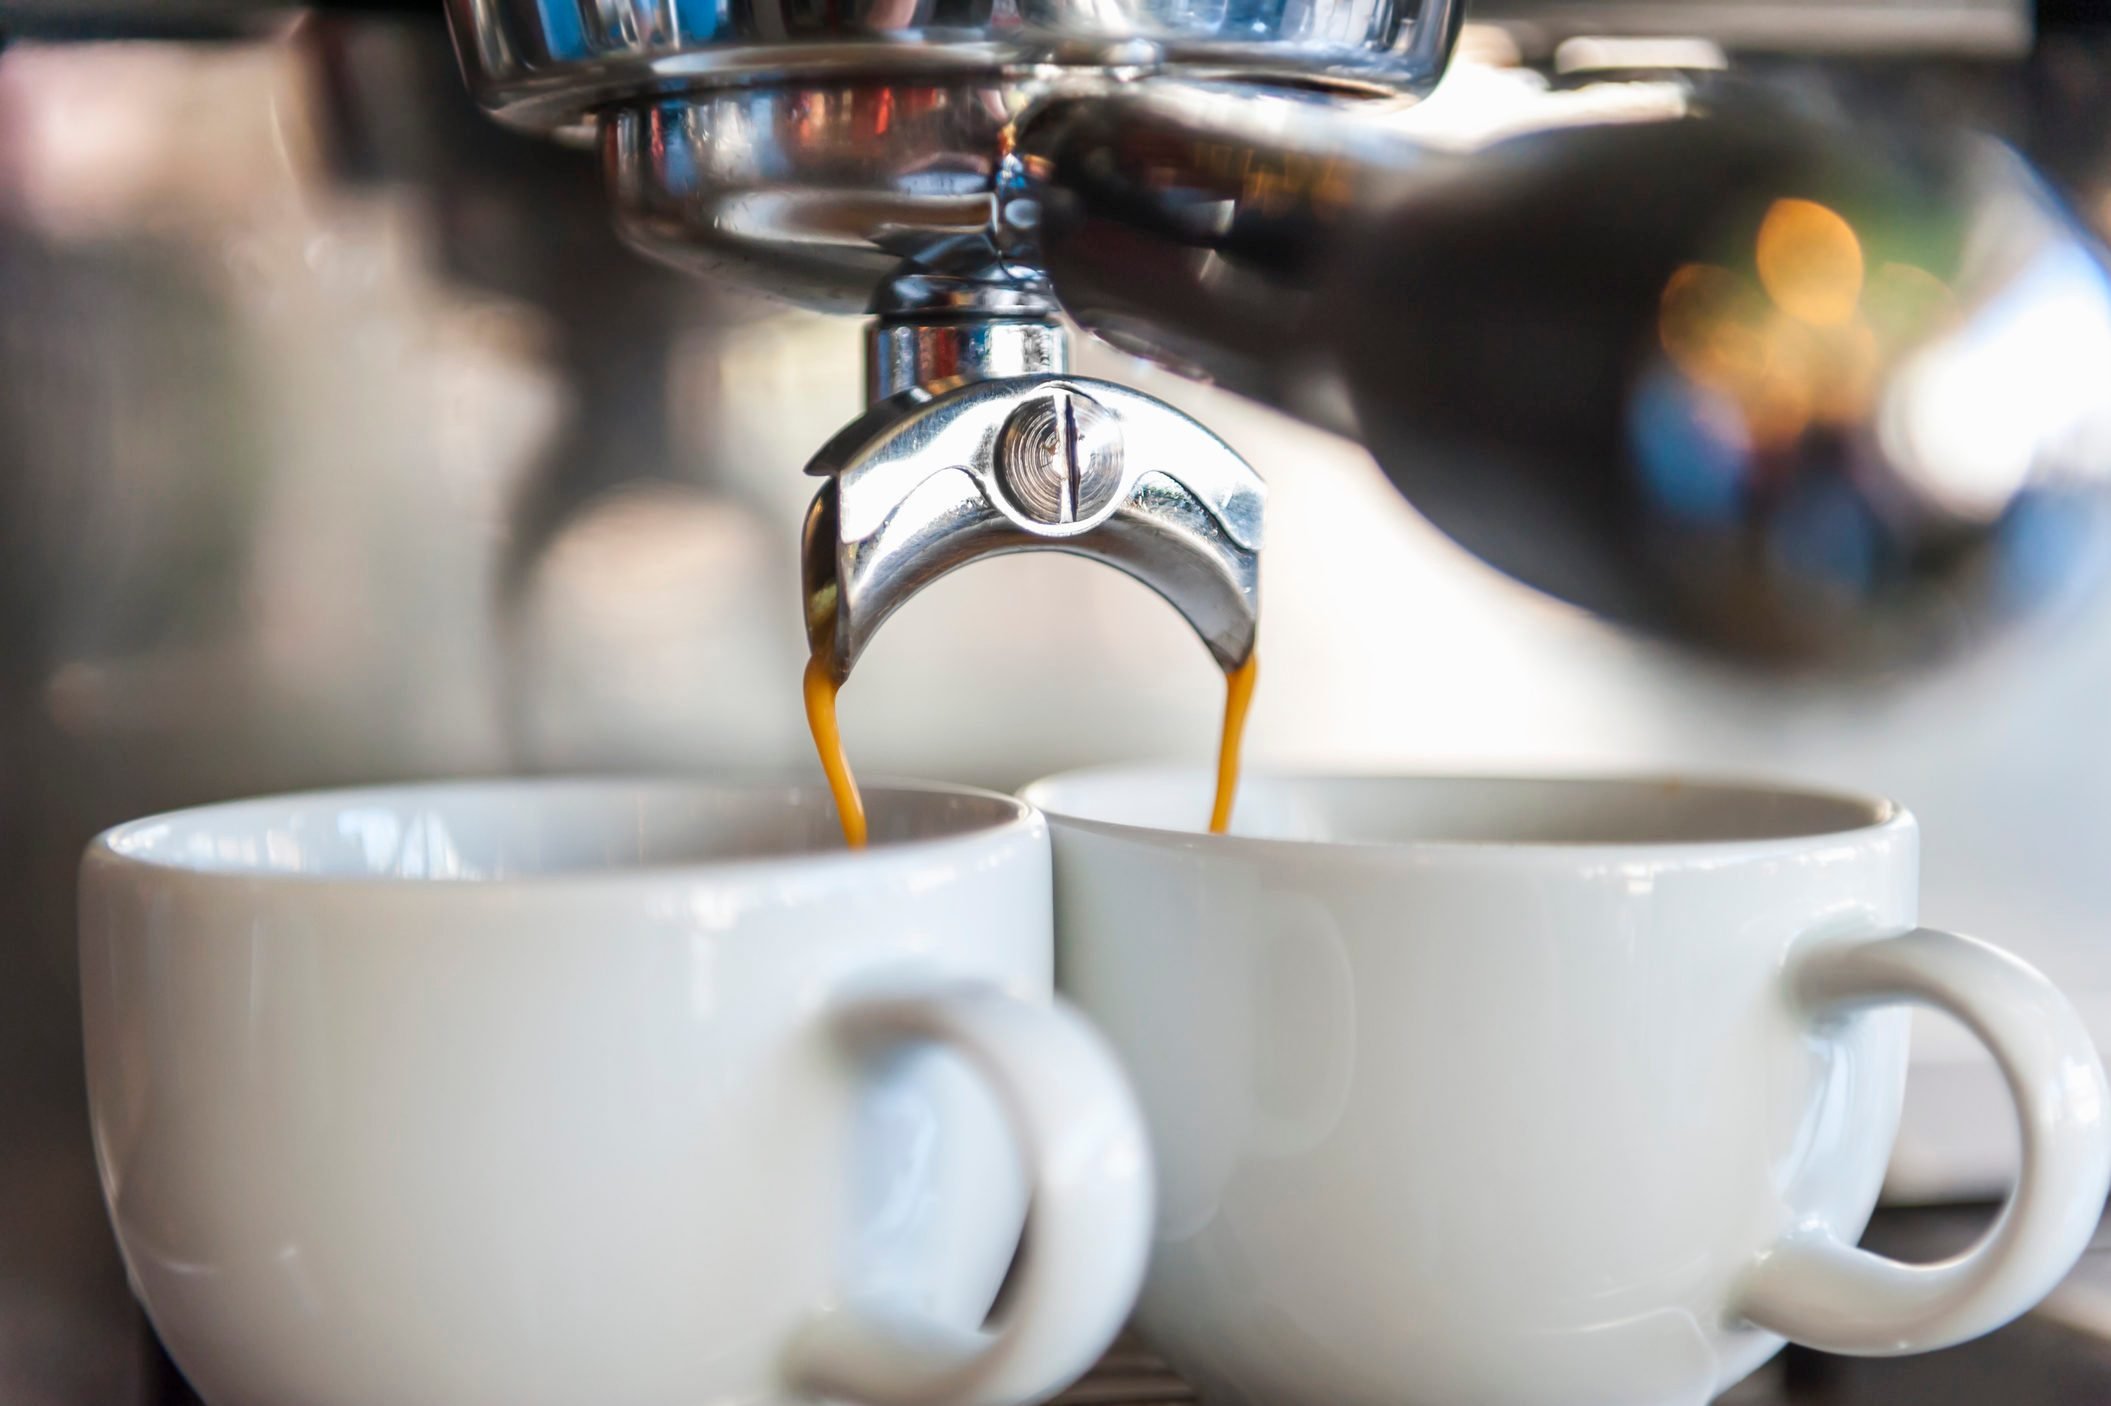 Coffee machine preparing two cups of coffee